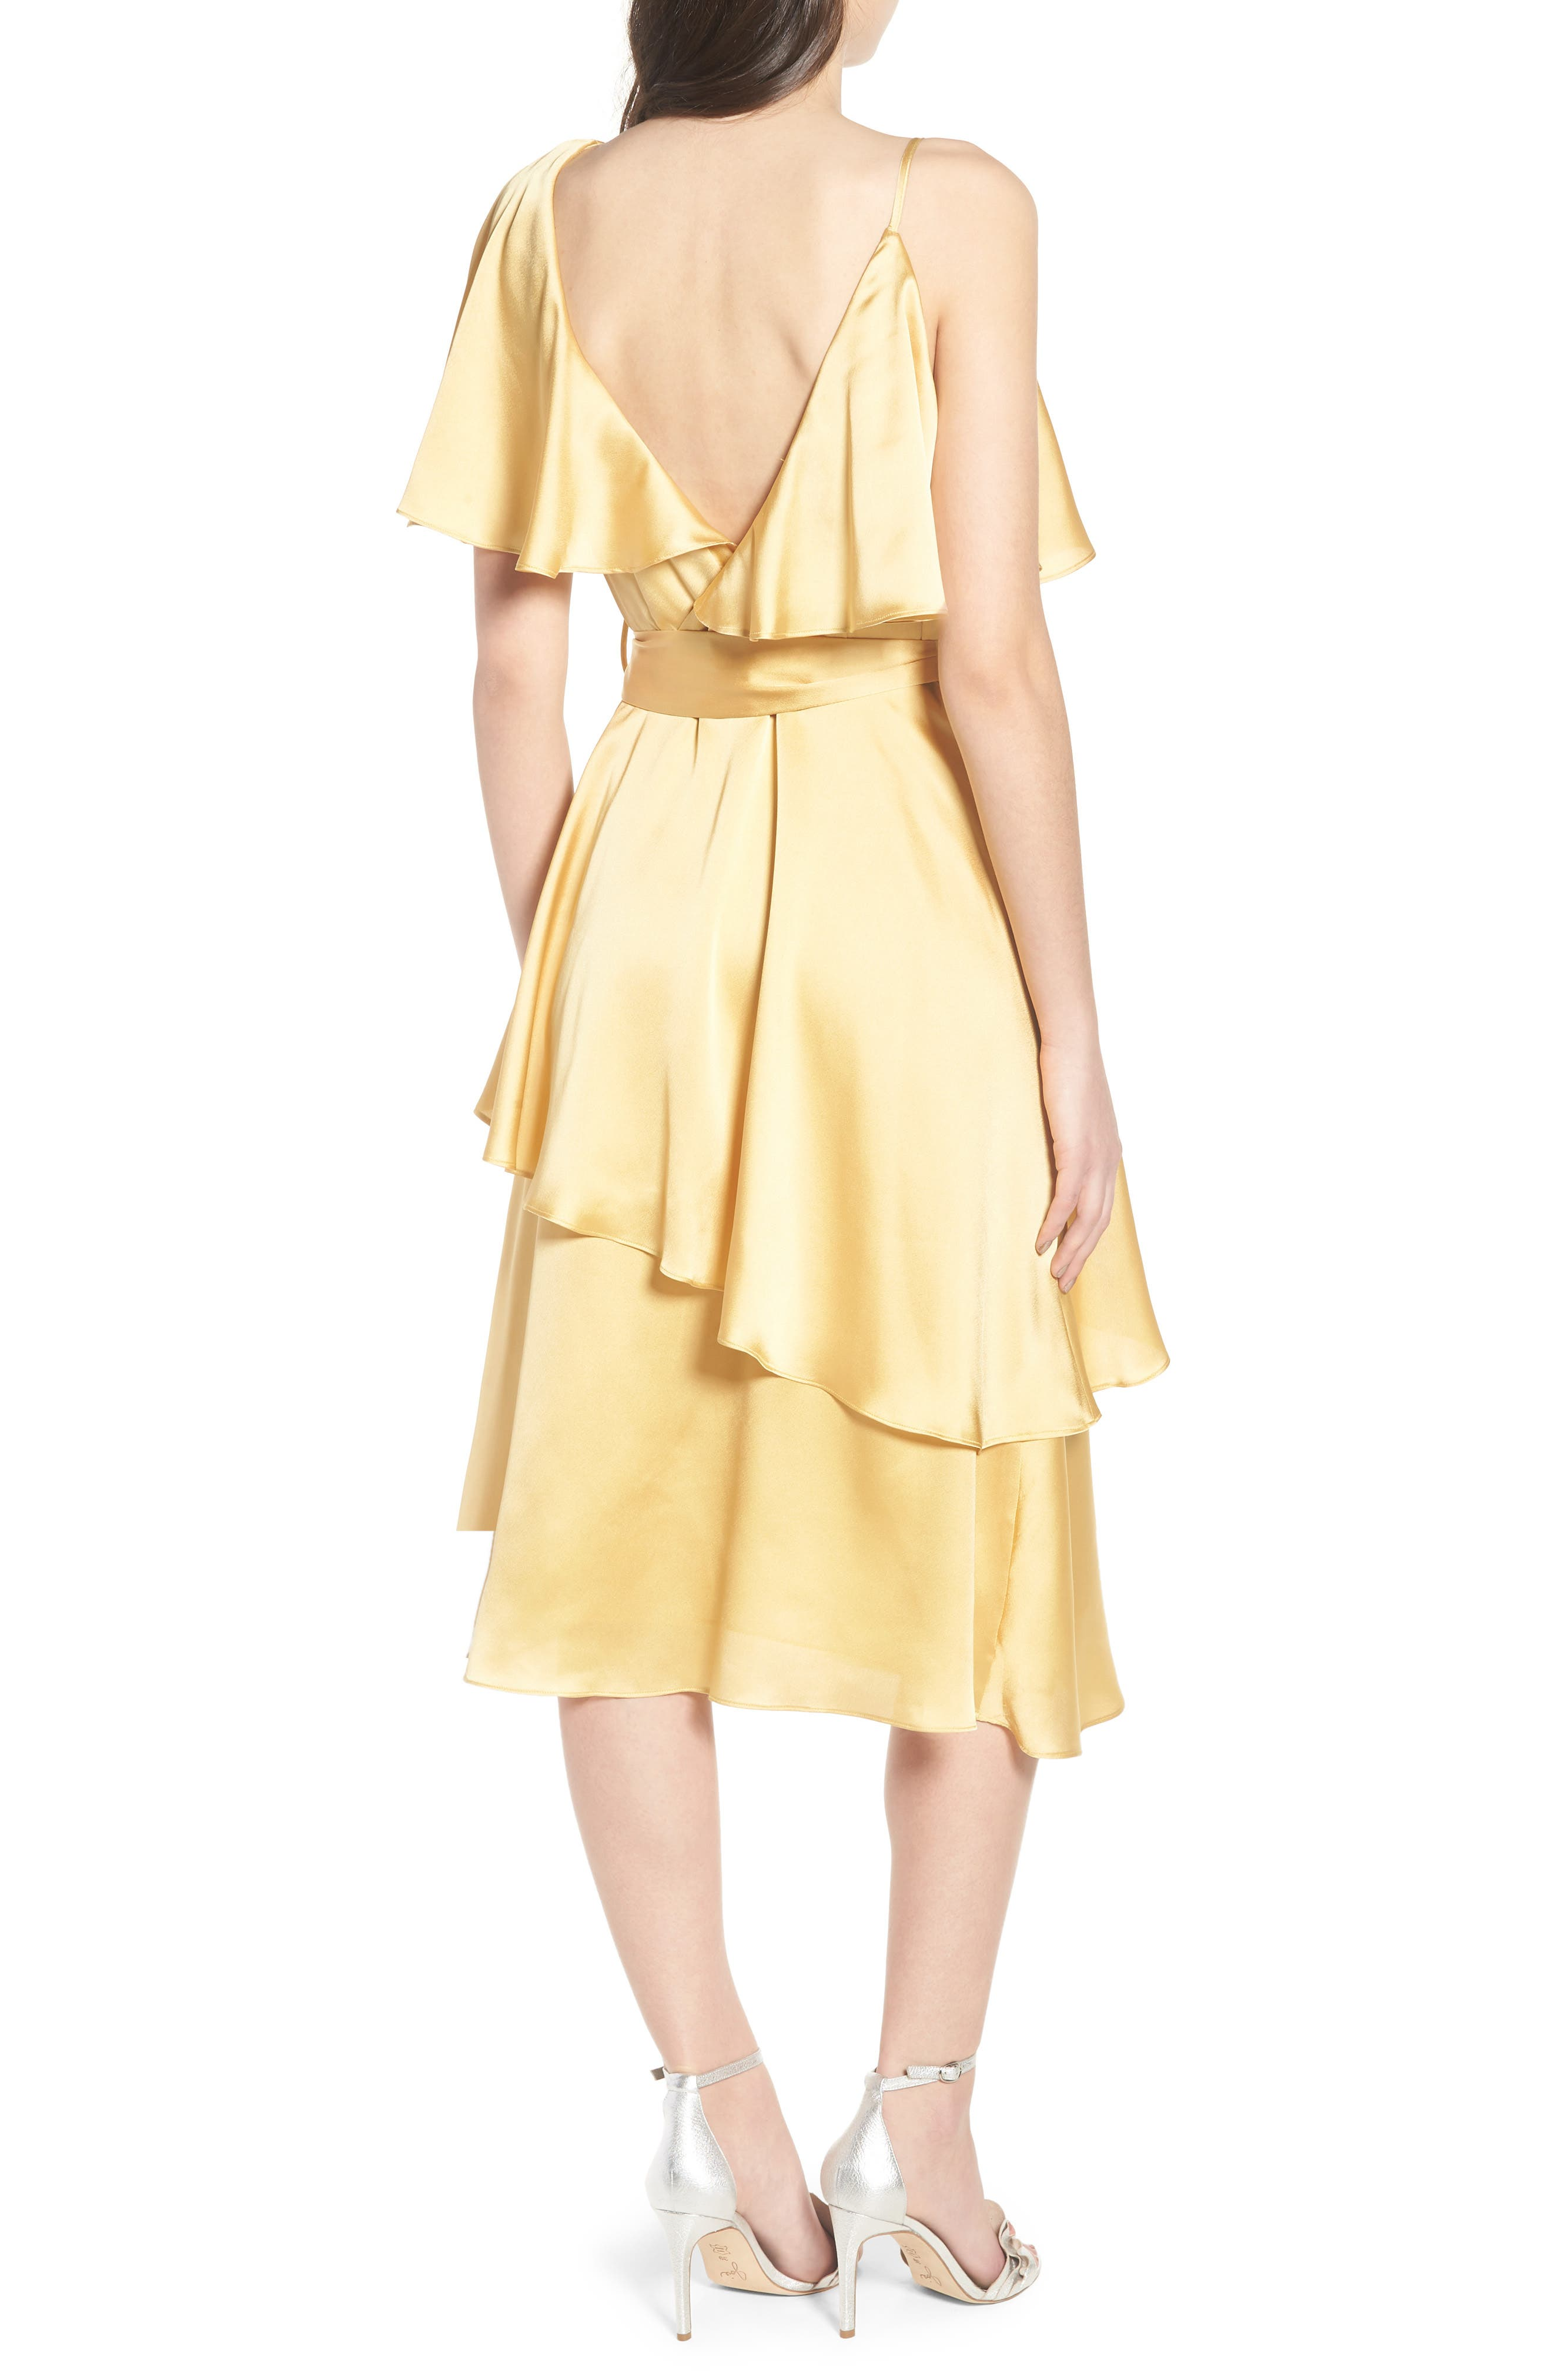 Deconstructed Tea Dress,                             Alternate thumbnail 3, color,                             Yellow